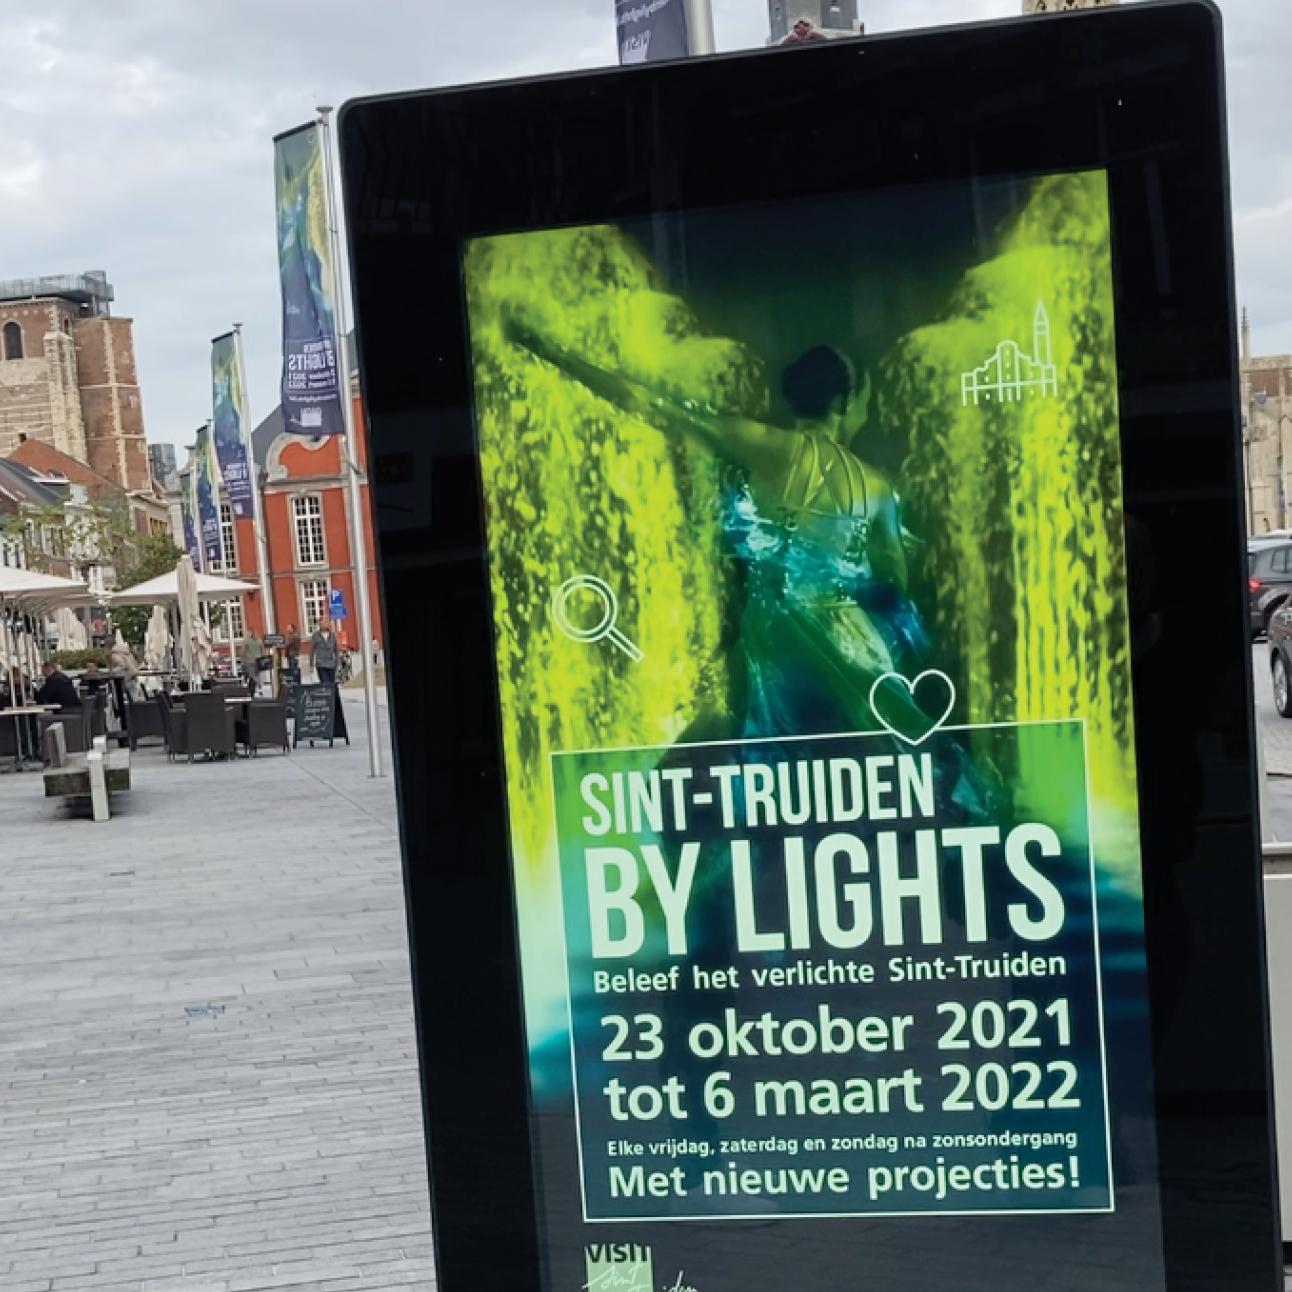 Sint-Truiden by lights 2021